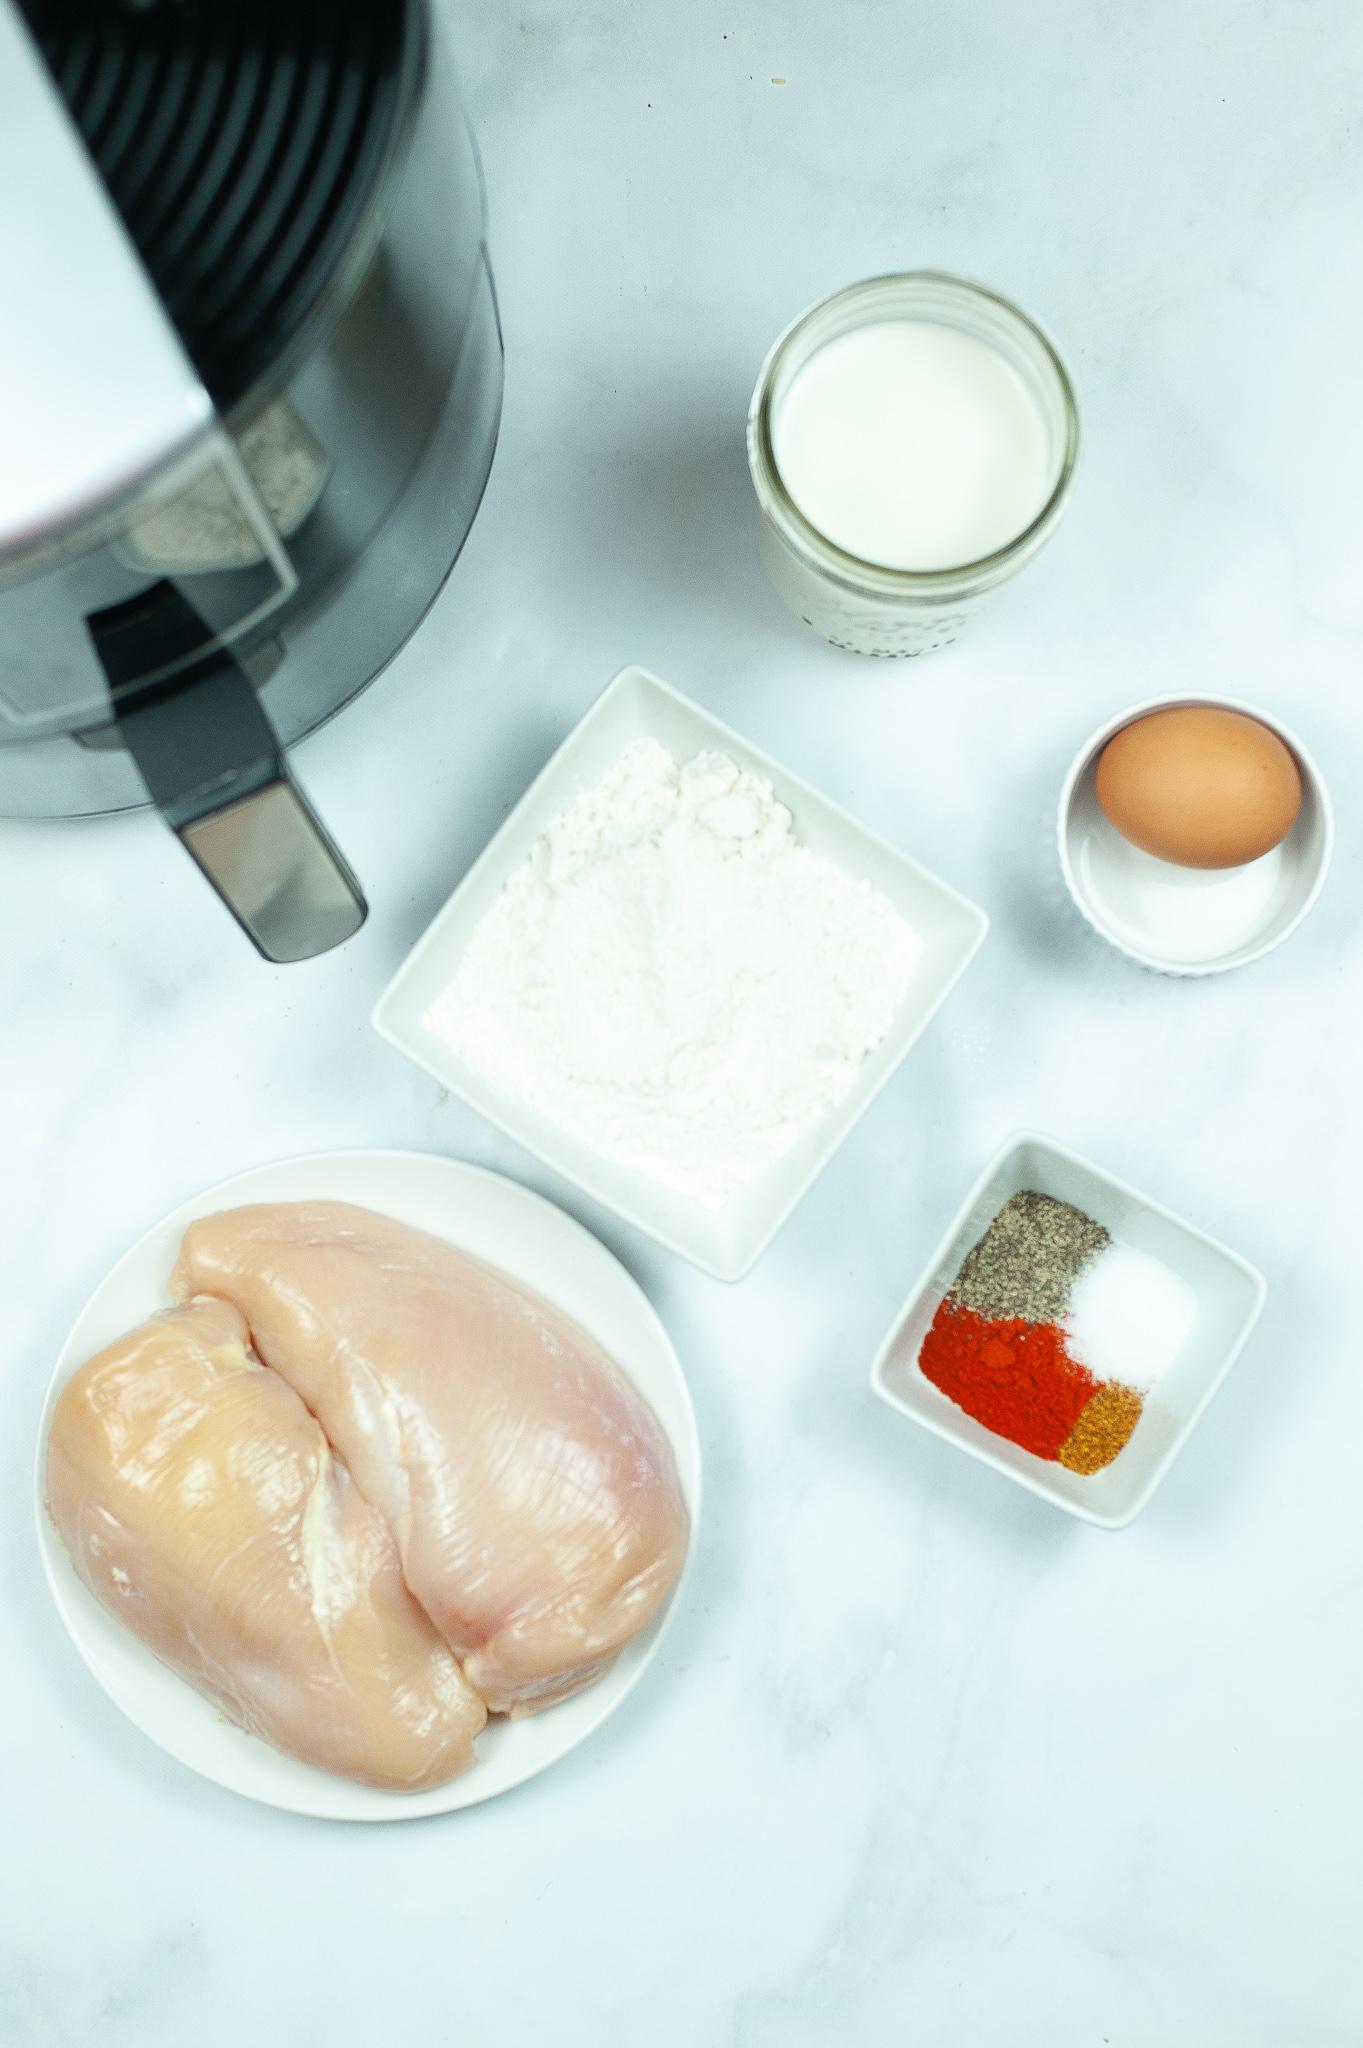 Chicken breast, flower eggs, milk and seasoning.